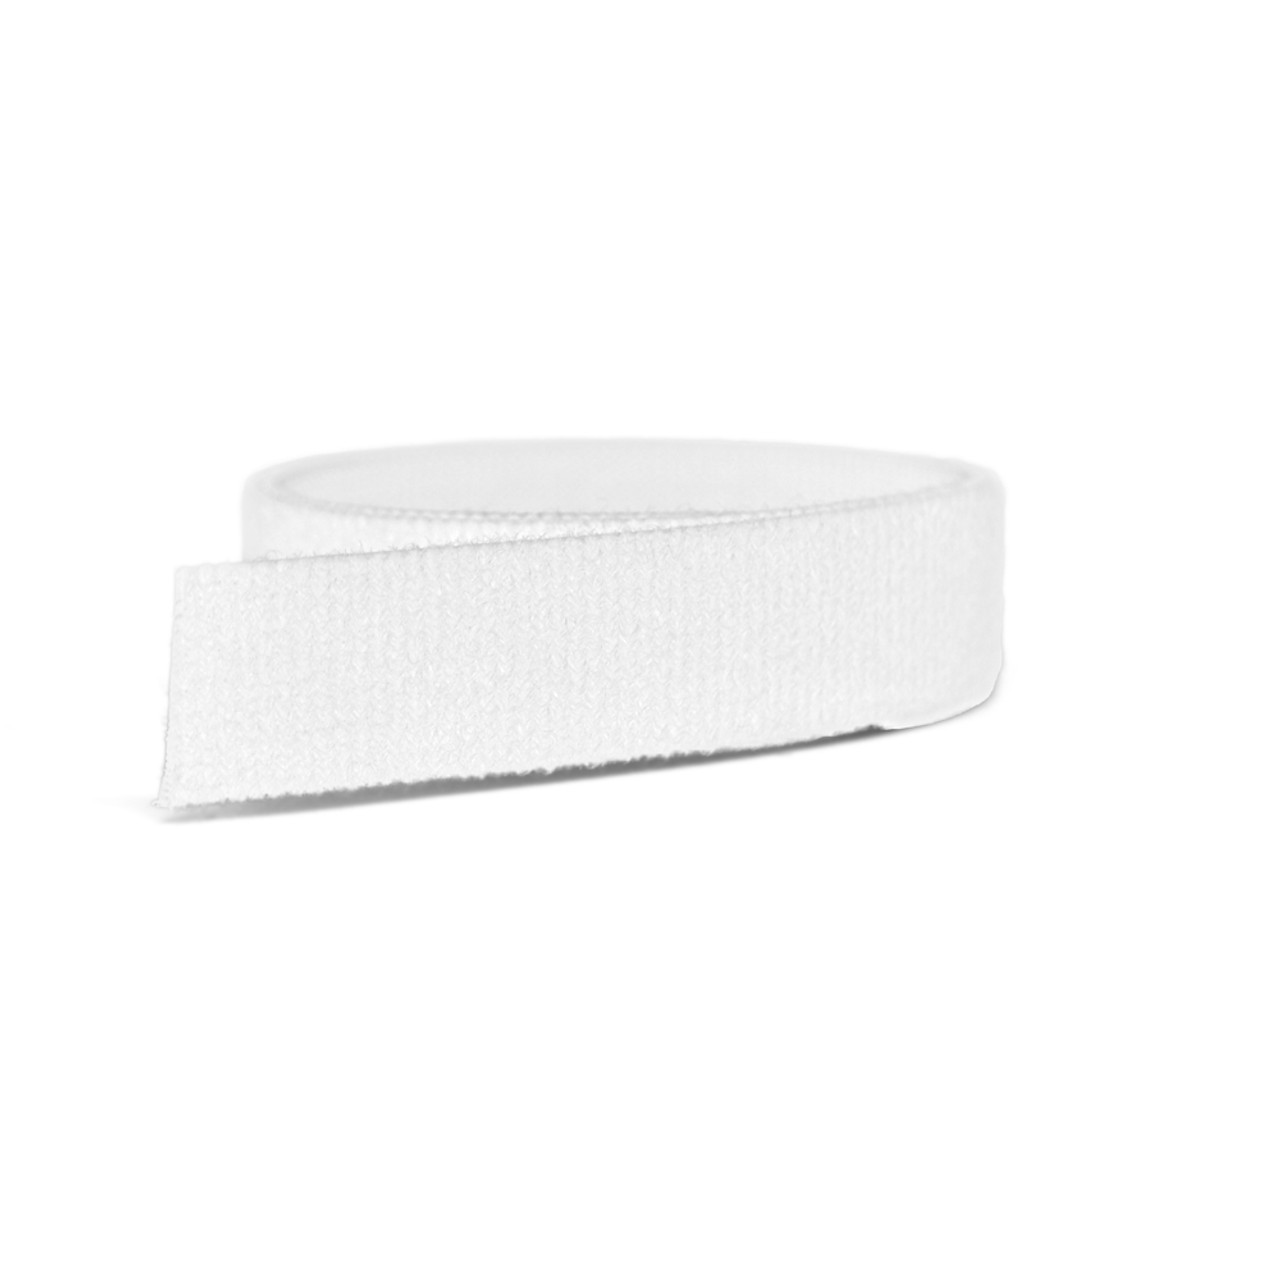 VELCRO® Brand ONE-WRAP® Tape White Mini Rolls